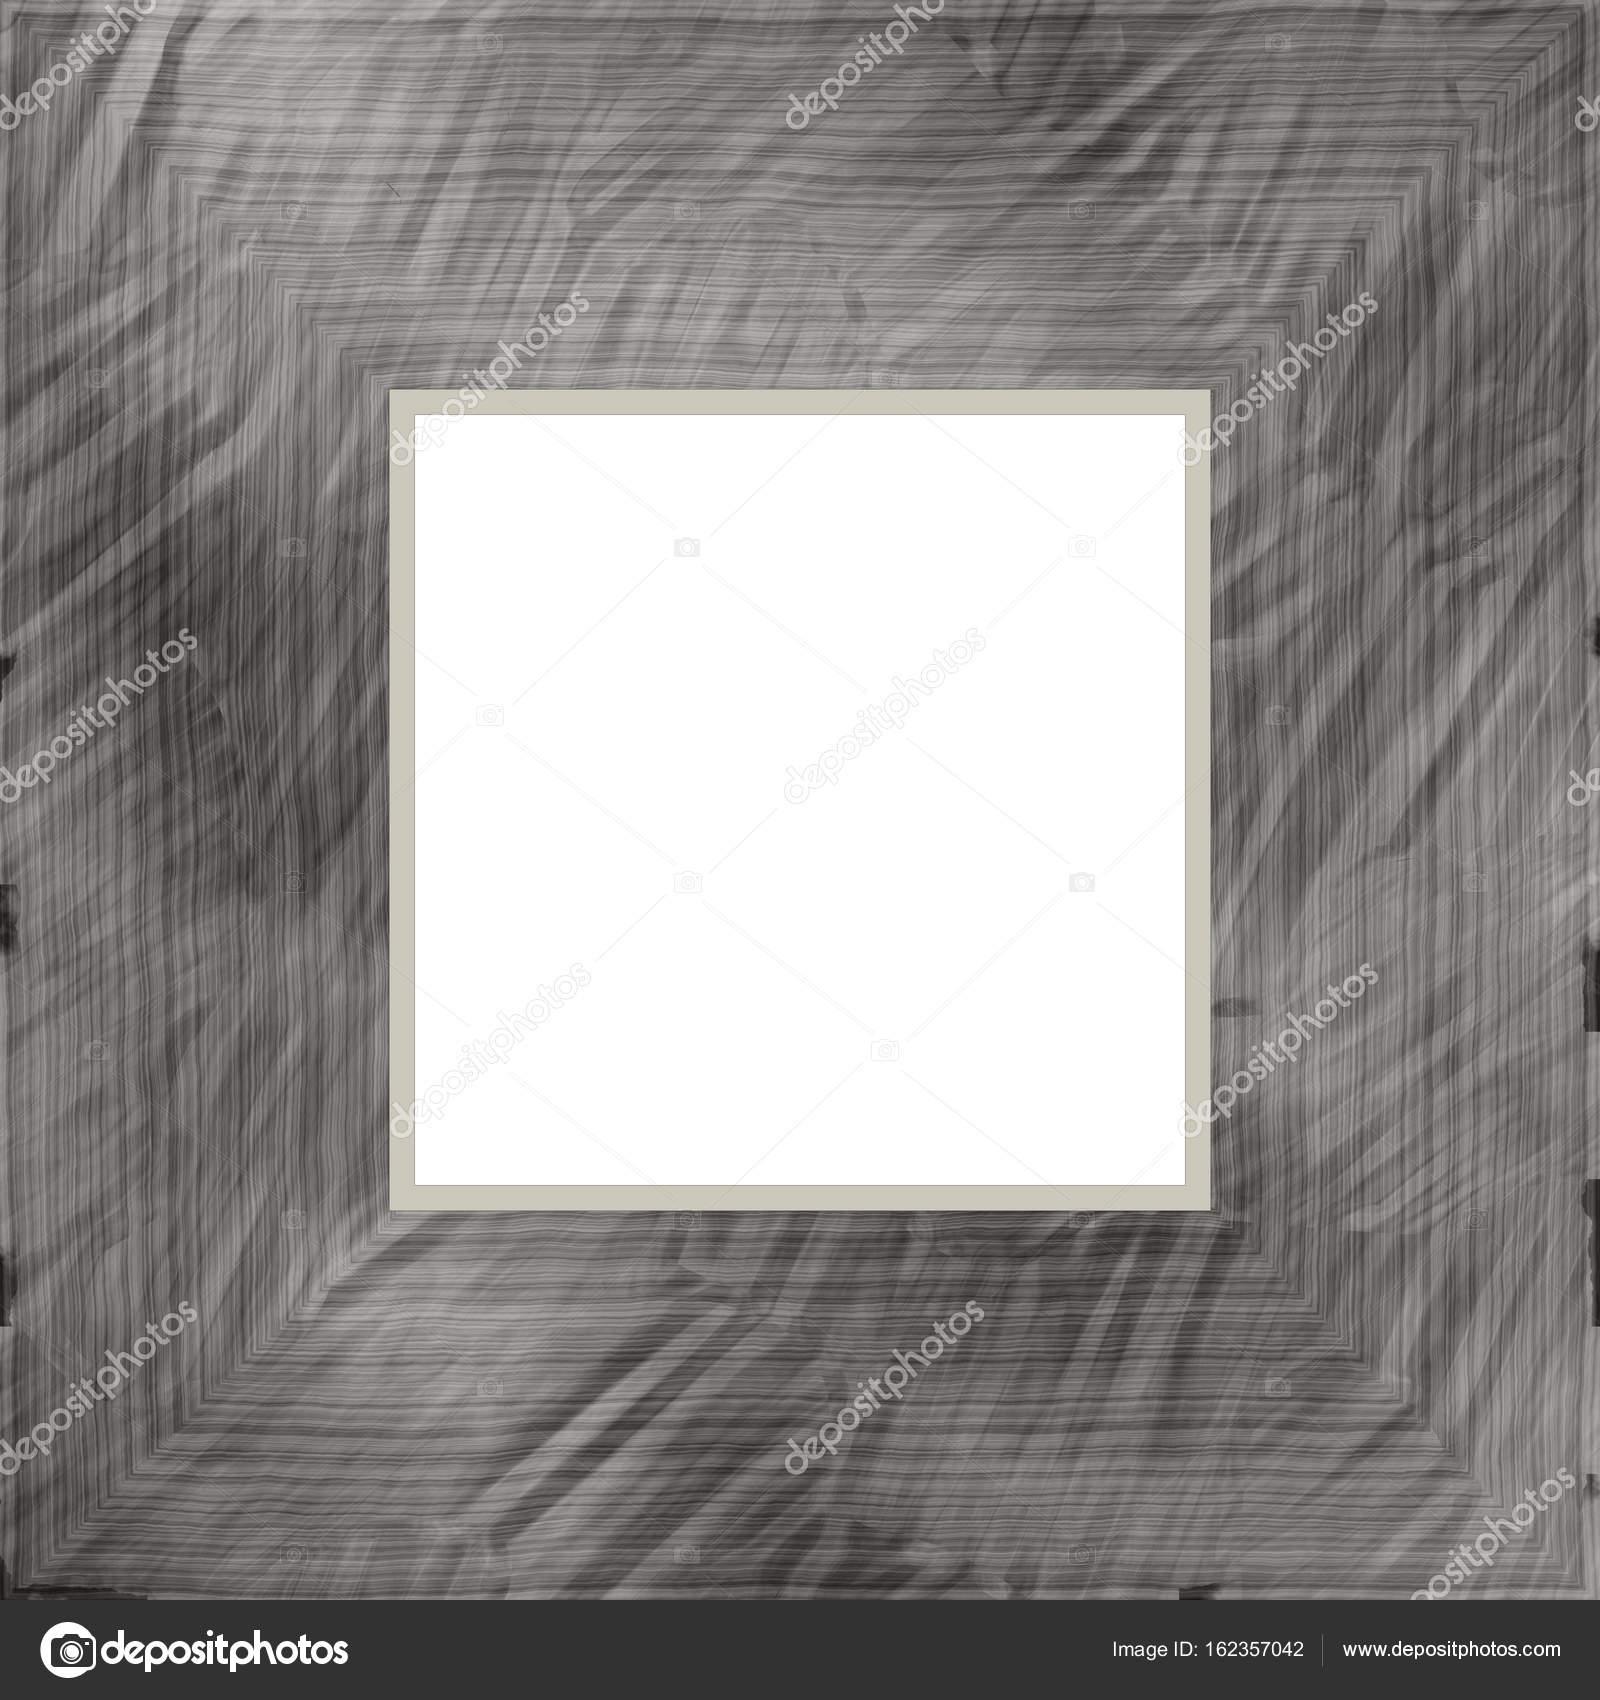 Fett grau verwittert quadratische Holz Bilderrahmen Gemälde Bild ...